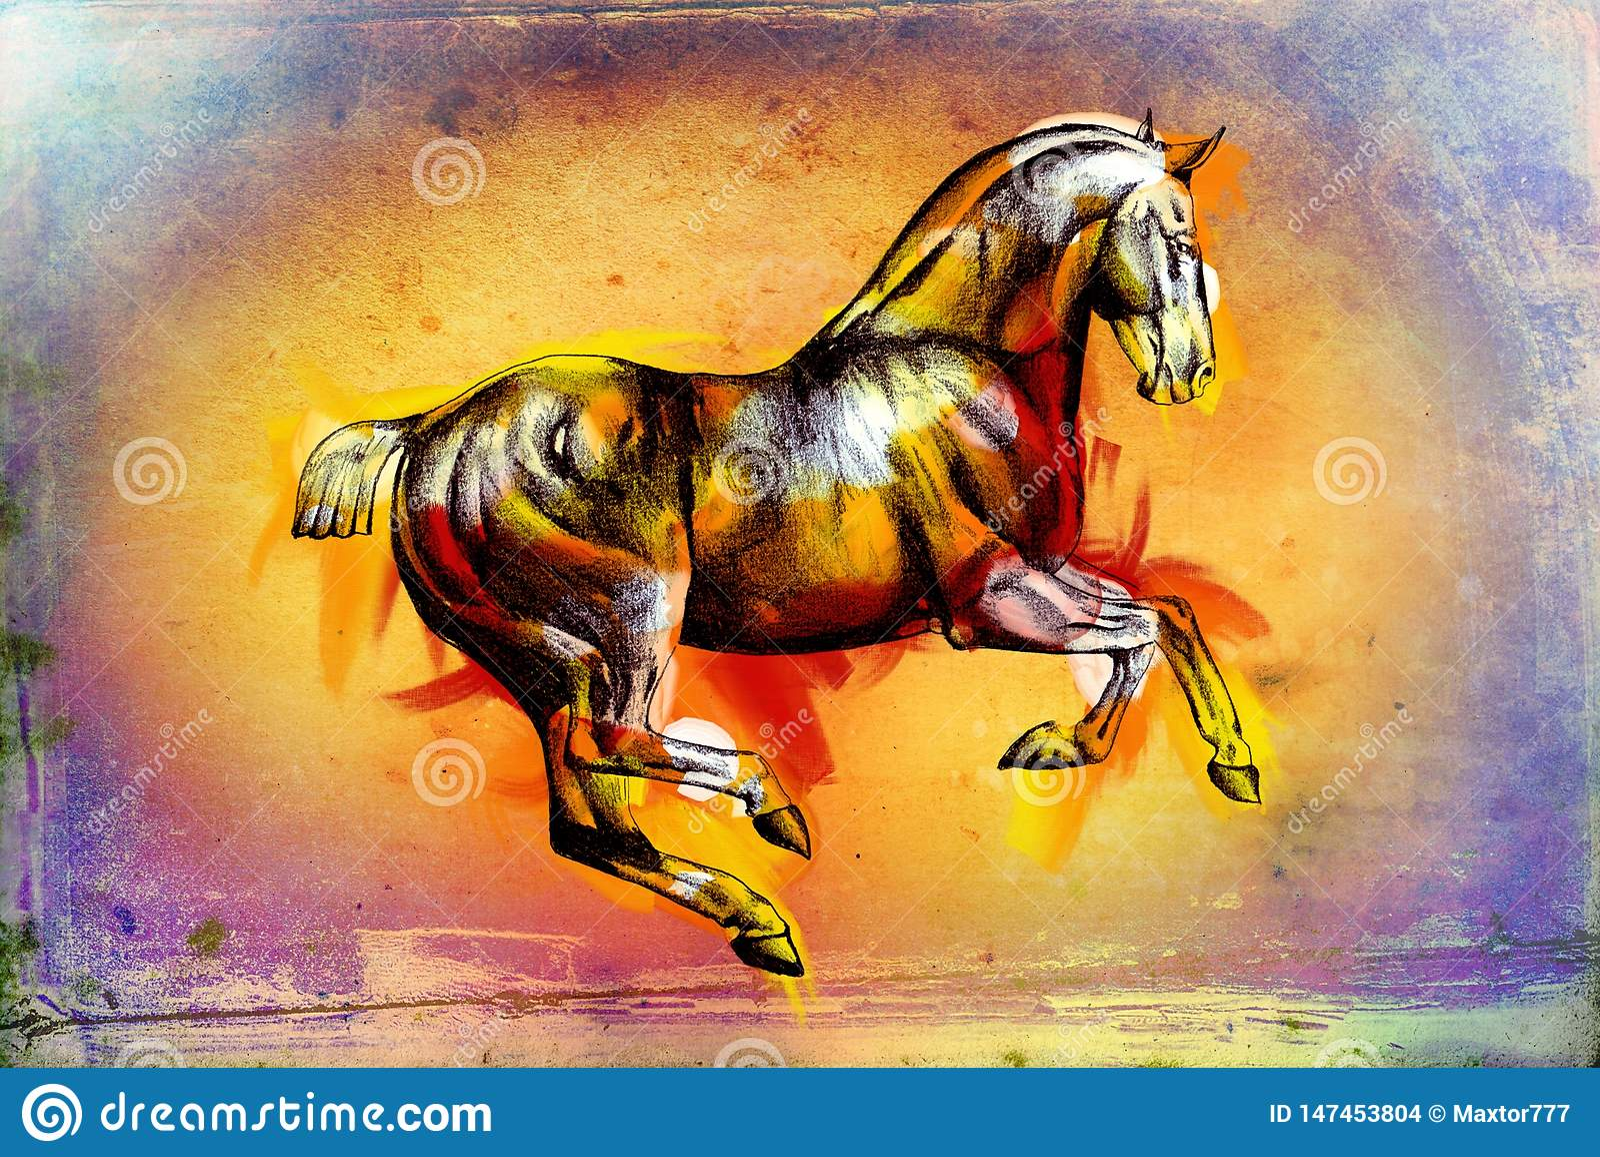 Original Oil Painting Of A Fine Arabian Horse Funny Artwork Stock